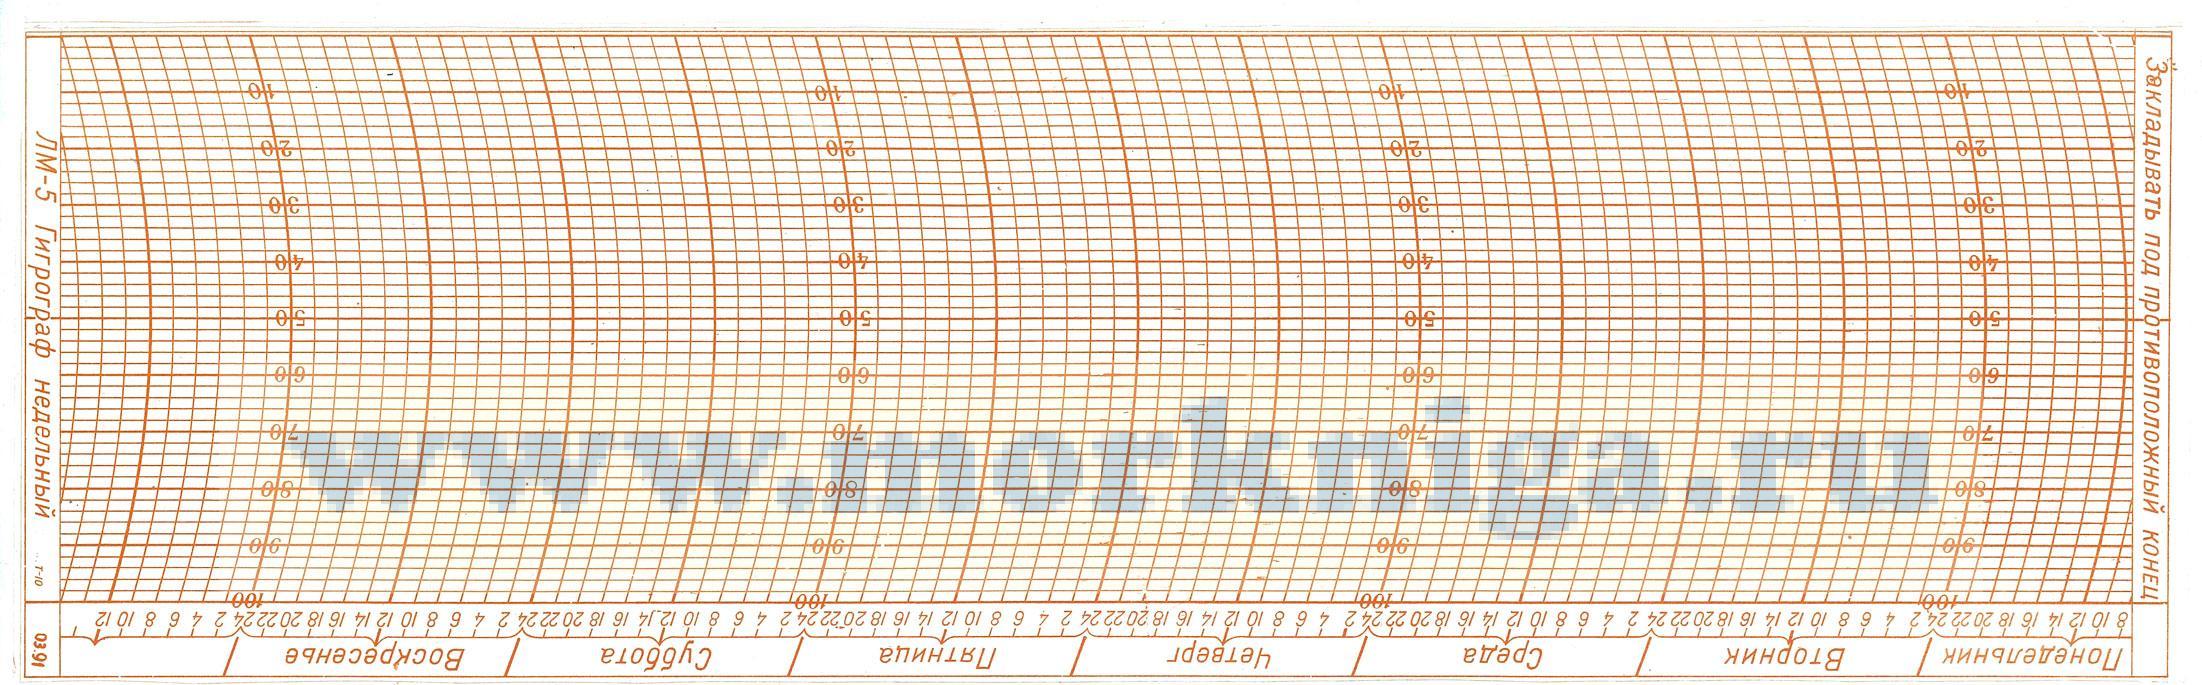 Бланк (лента) для гигрографа М-21А